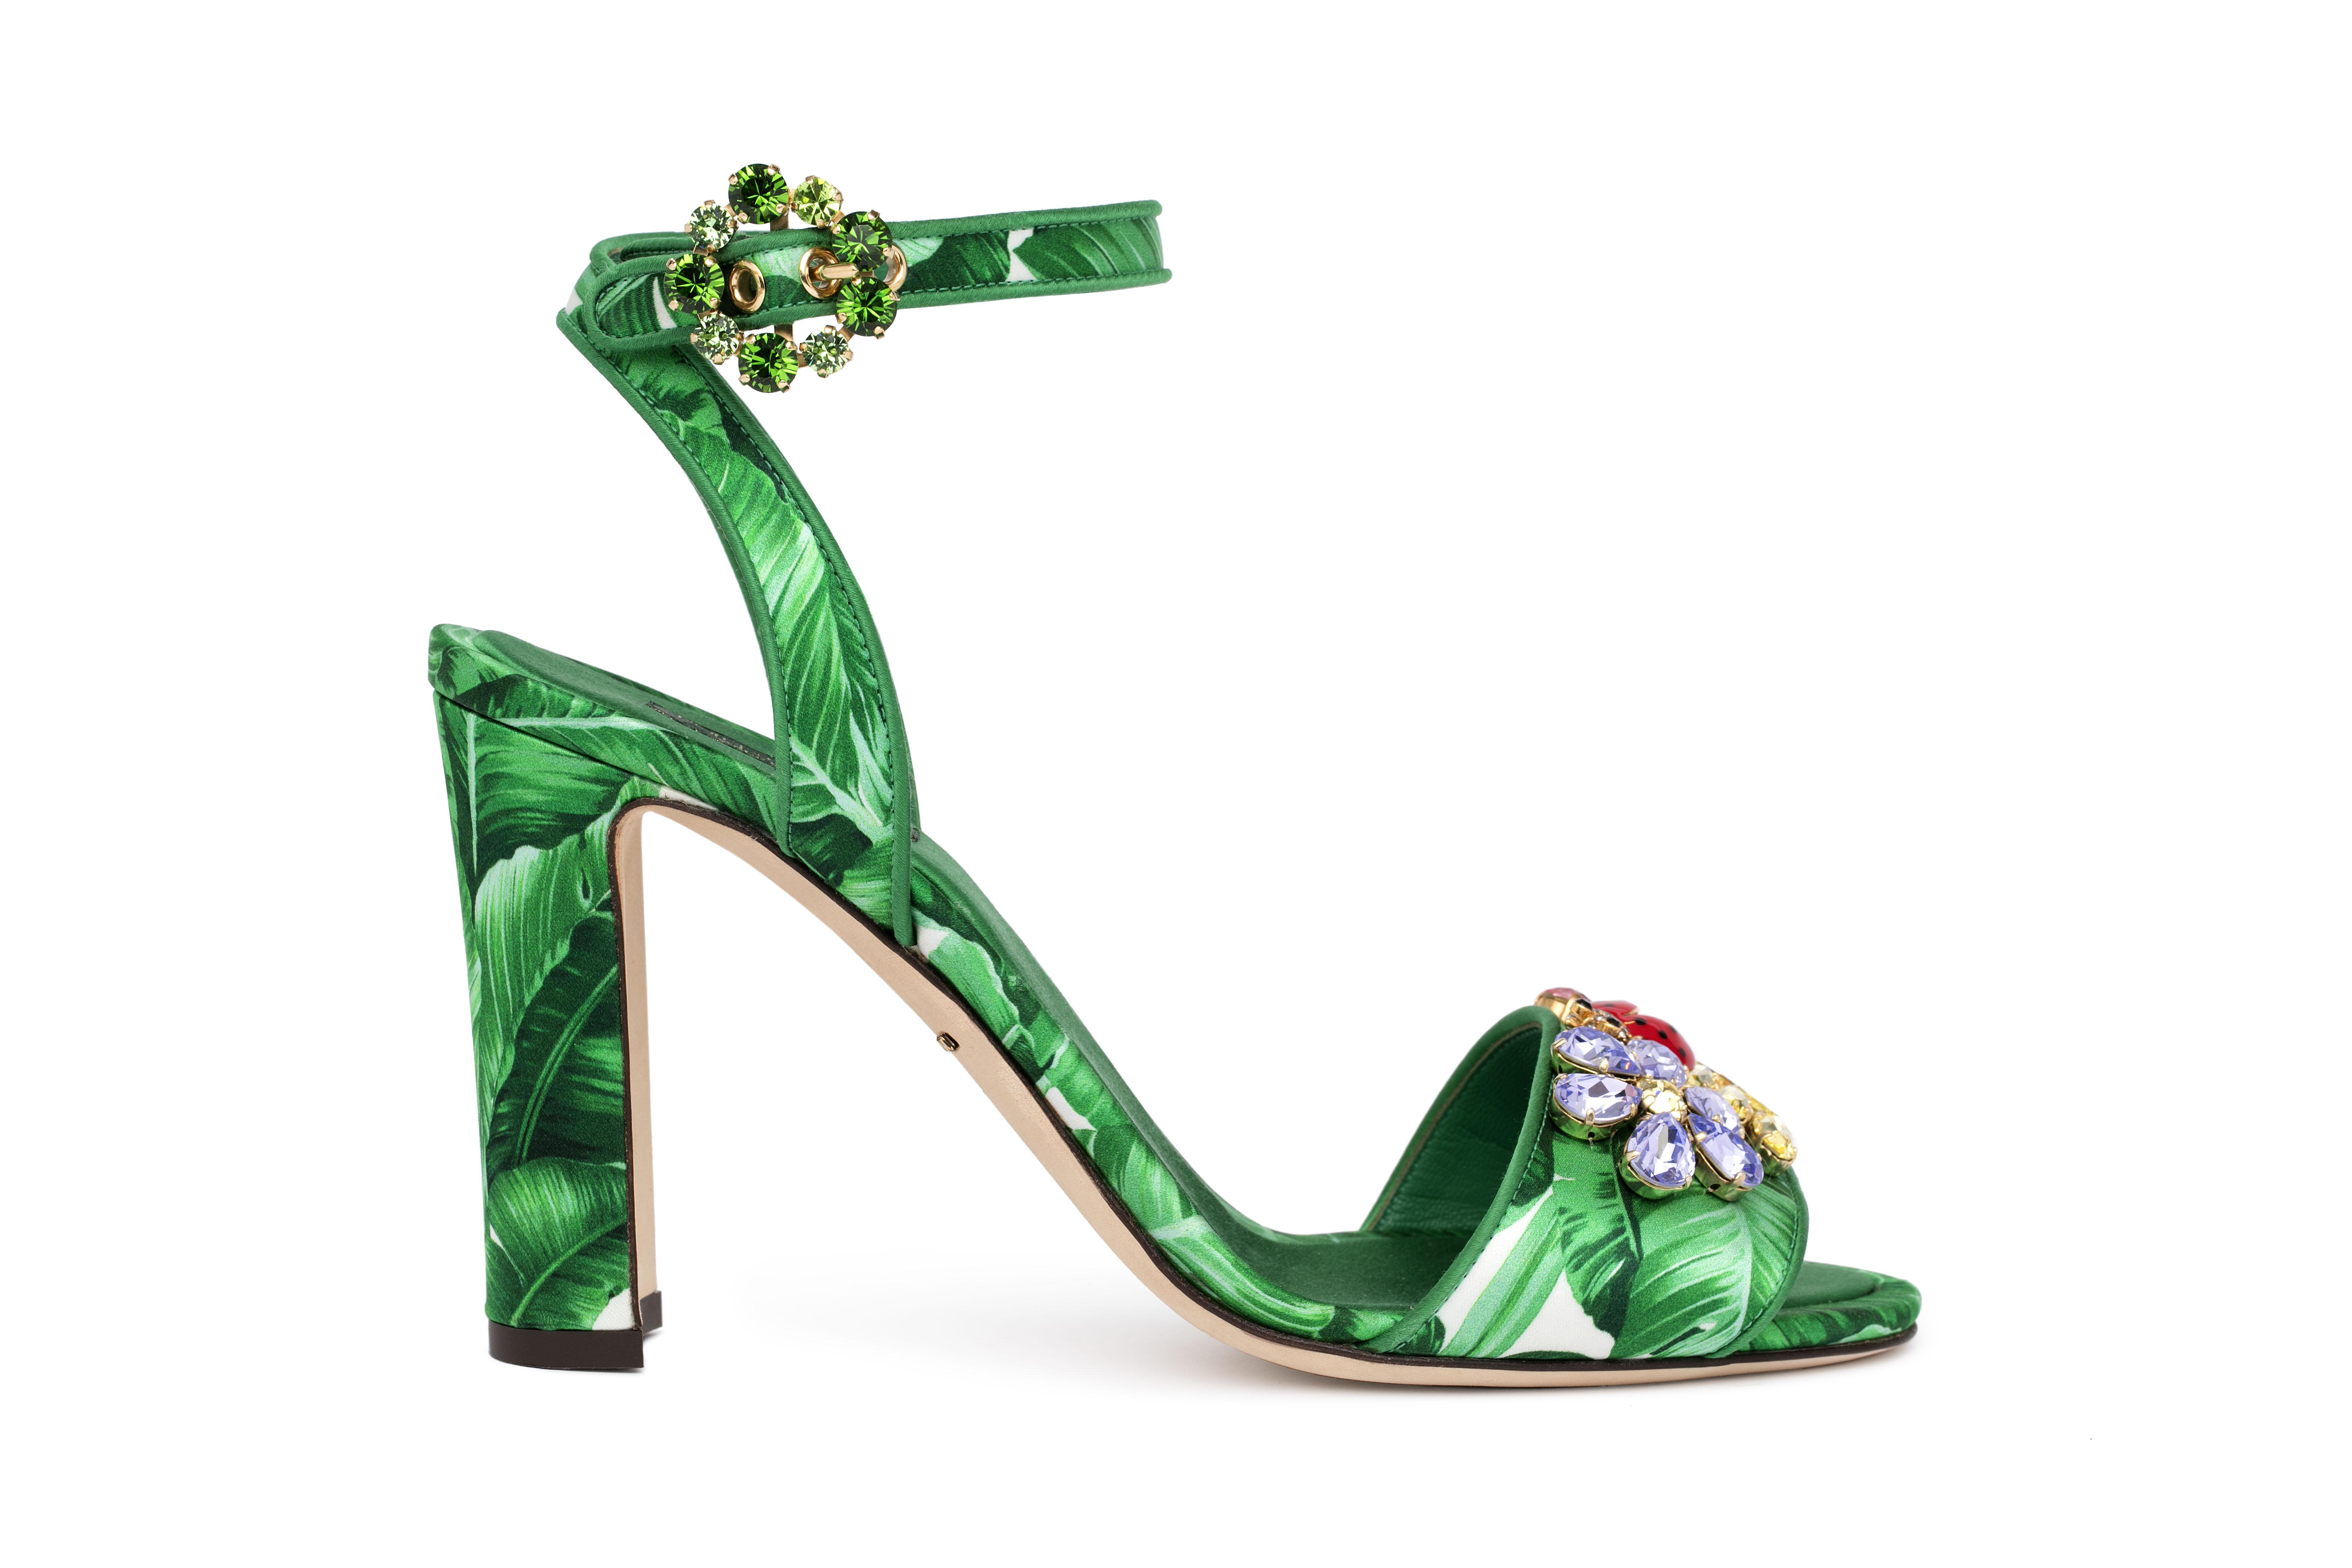 Dolce&Gabbana_acc_fw16-17 (24)